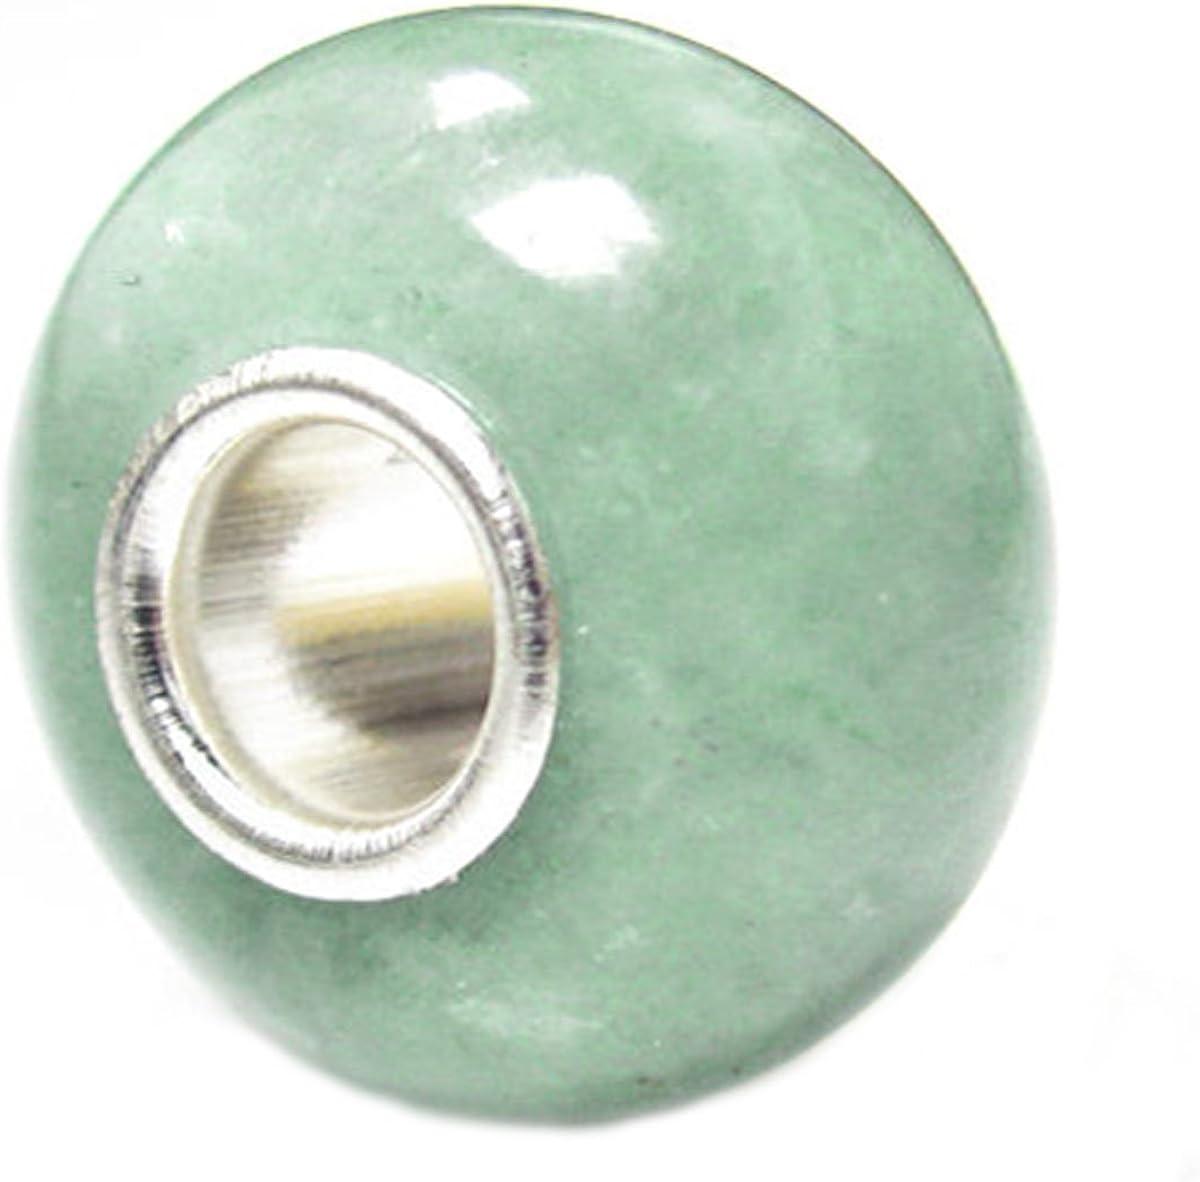 Queen Berry Clip de perla colgante plata de ley 925jade piedra Bead para pandora/Troll/Chamilia/Biagi/europeos Charm de pulseras